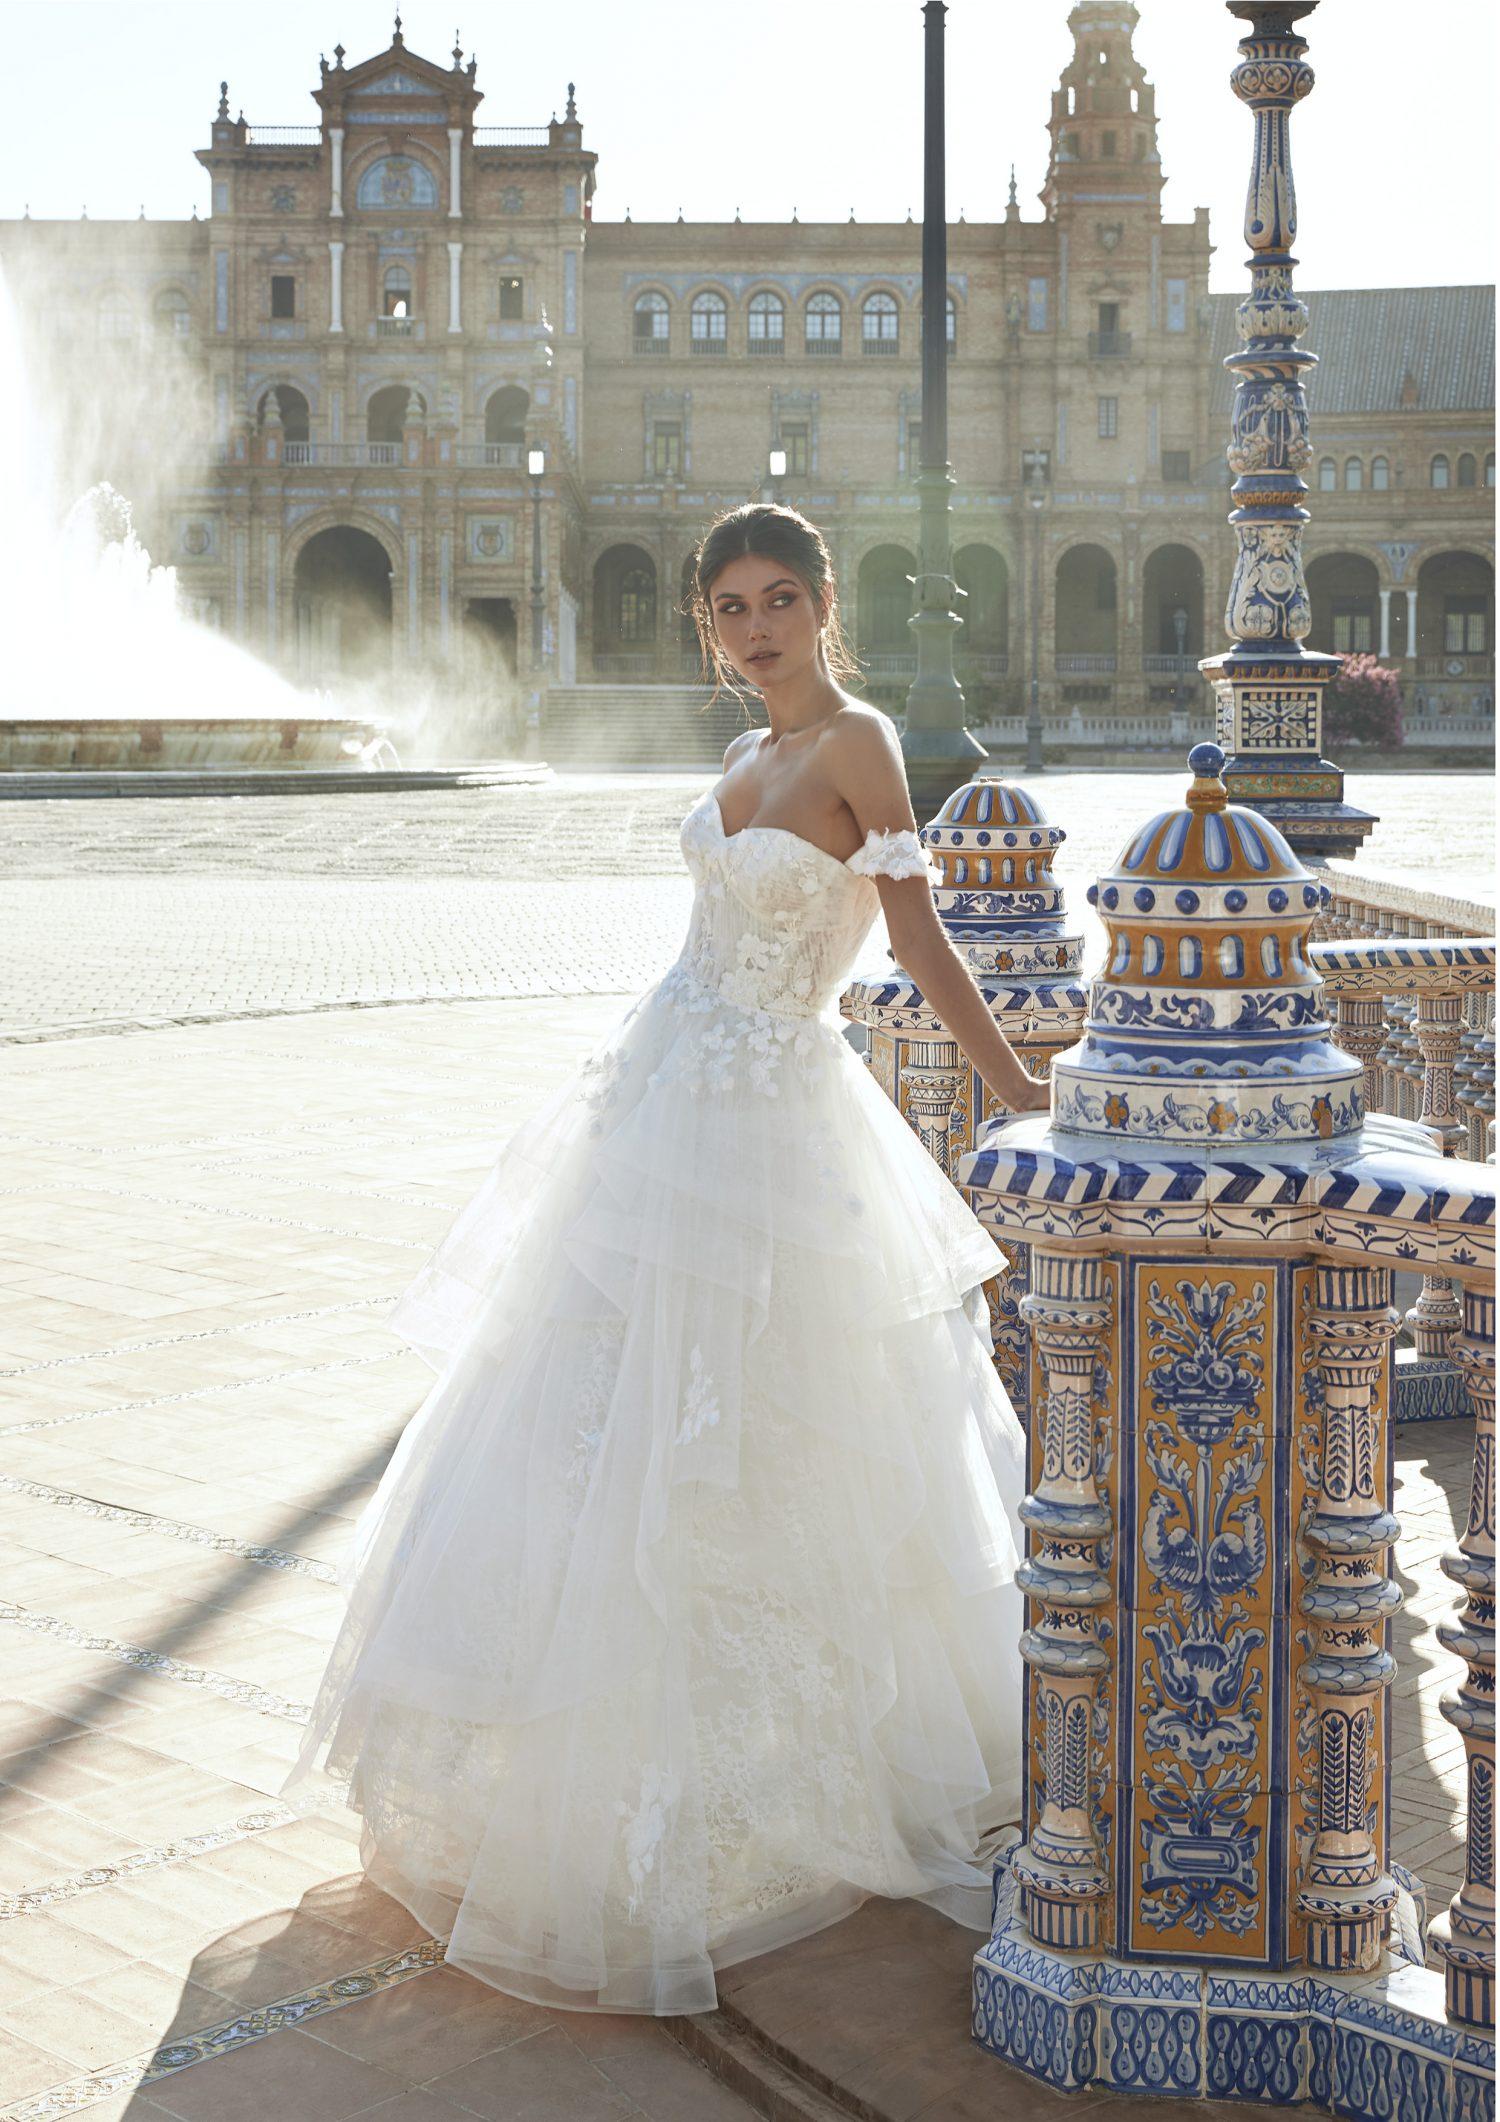 Pronovias vestidos de Novia 2021 Marchesa 26 - Marchesa la Nueva Colección de Vestidos de Novia Pronovias 2021